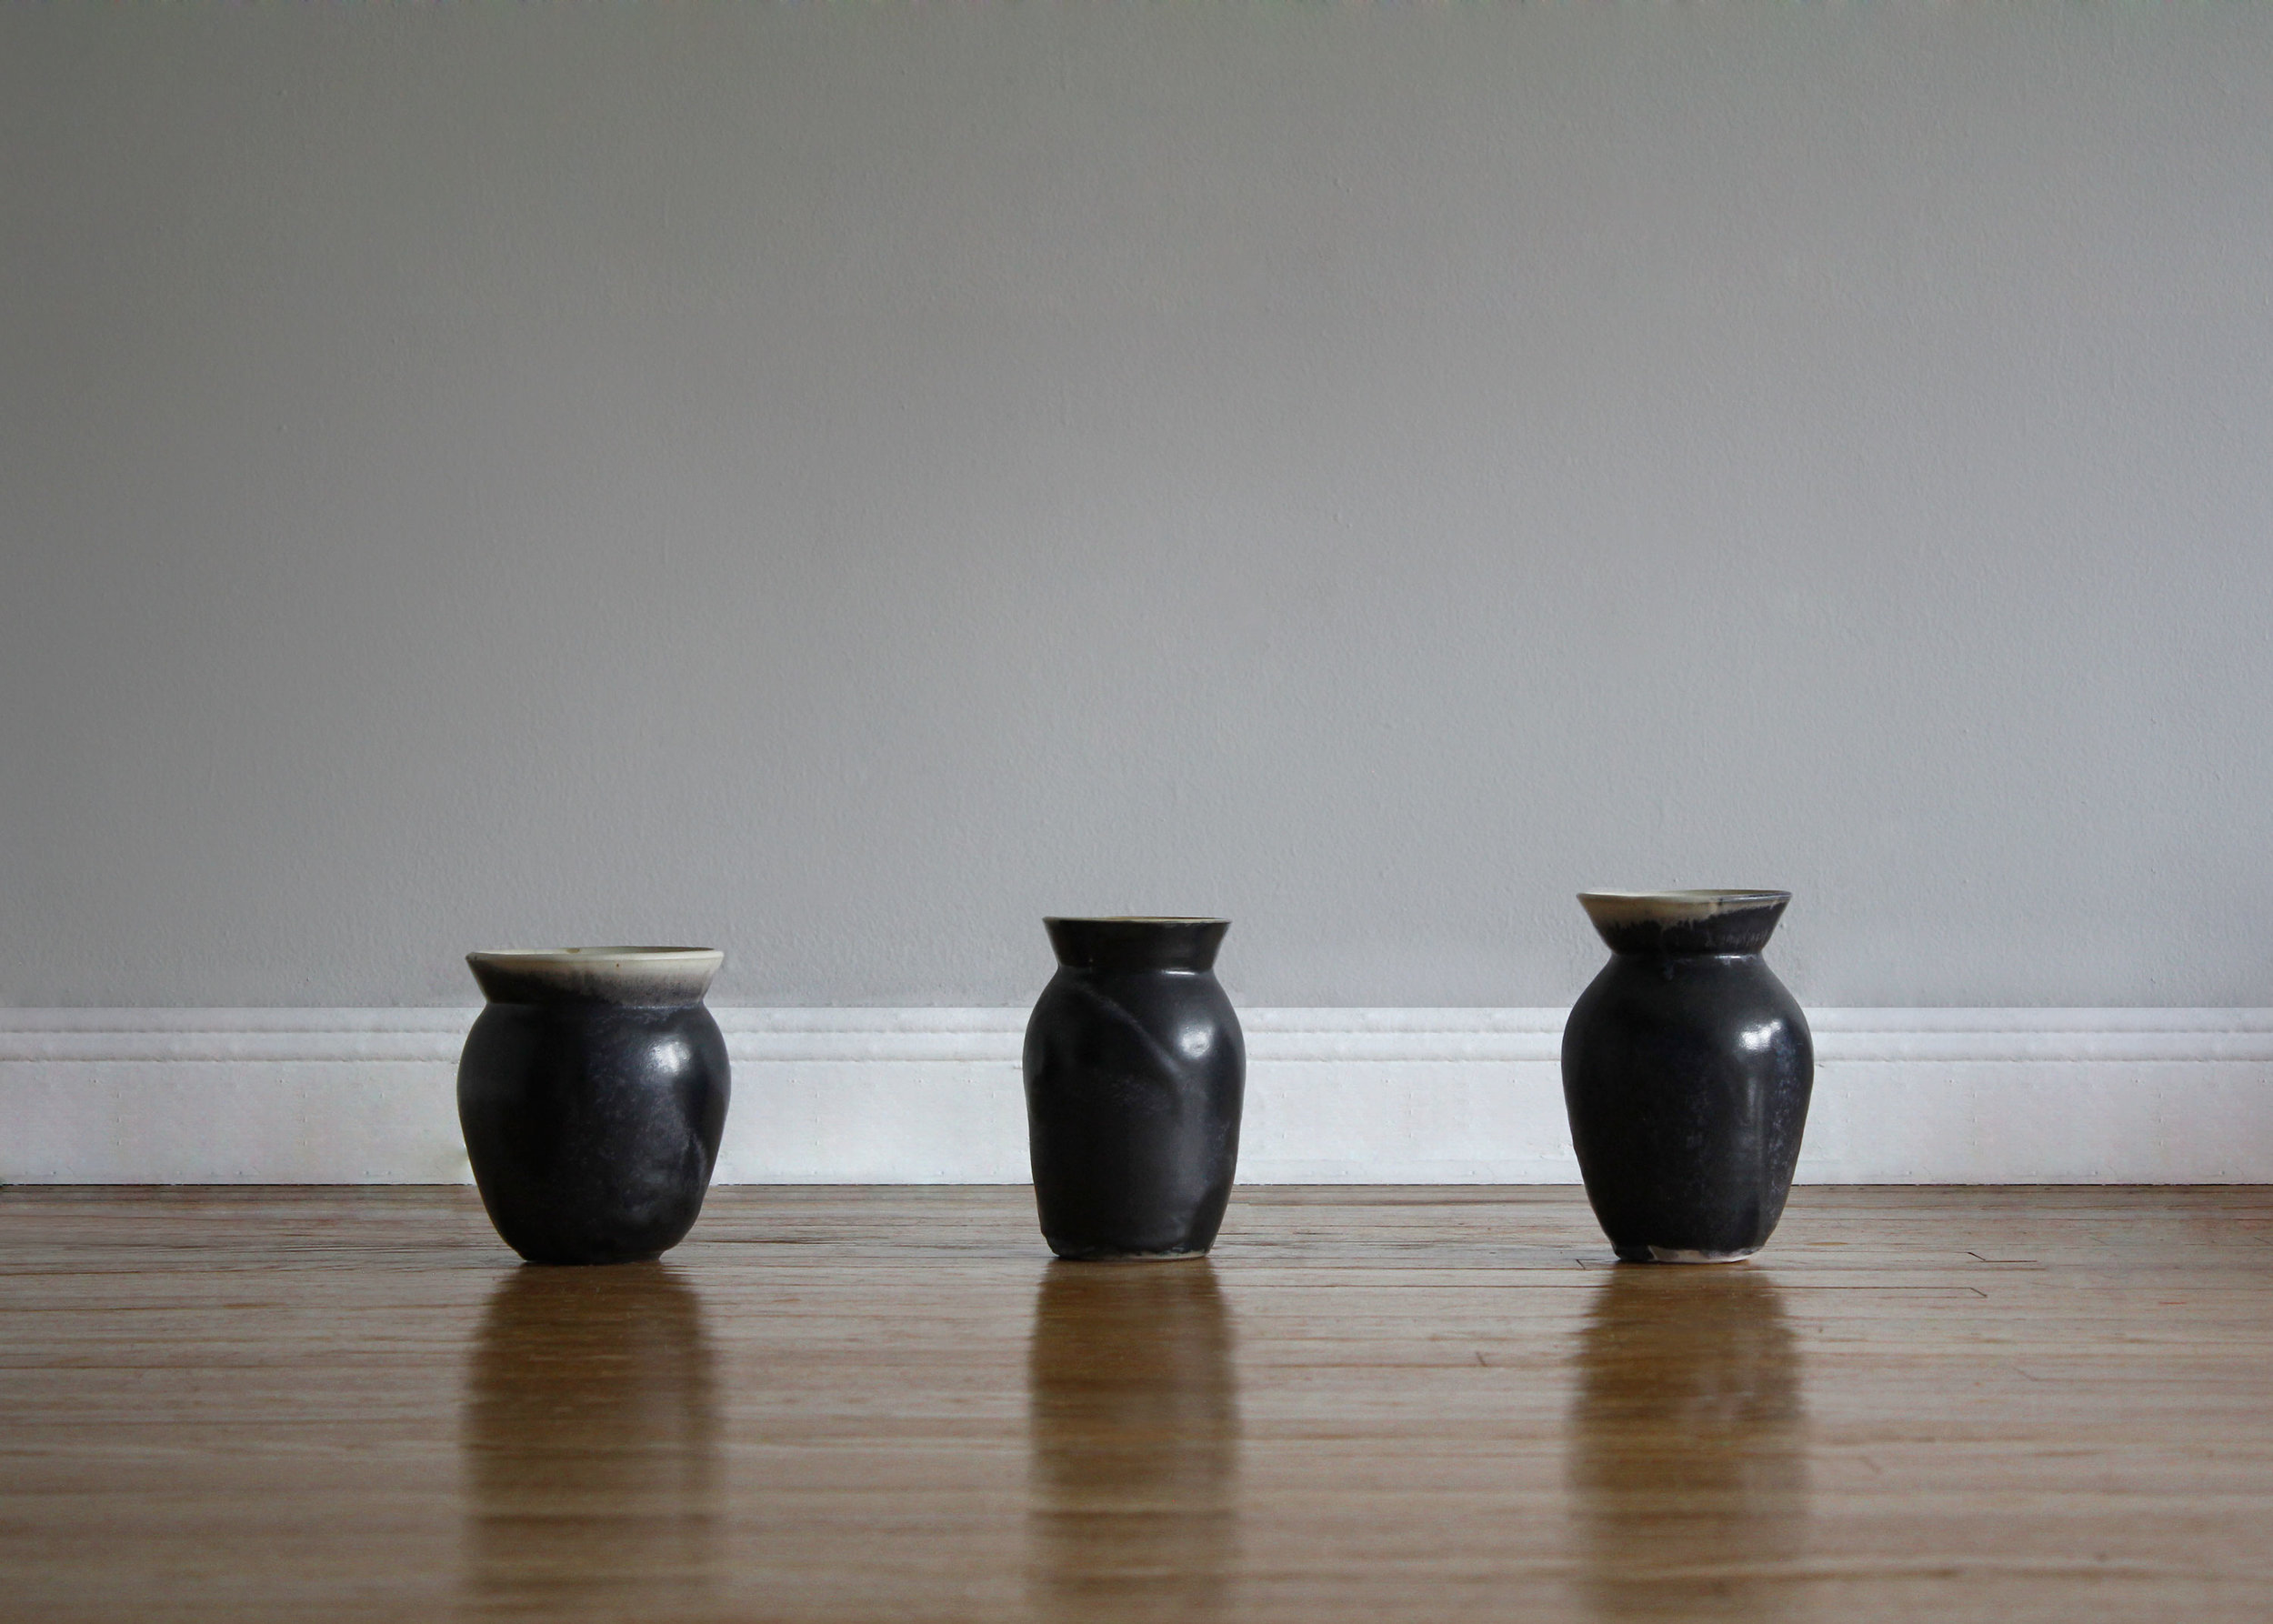 James-Rivas_Decay-Vase-Series_E.jpg